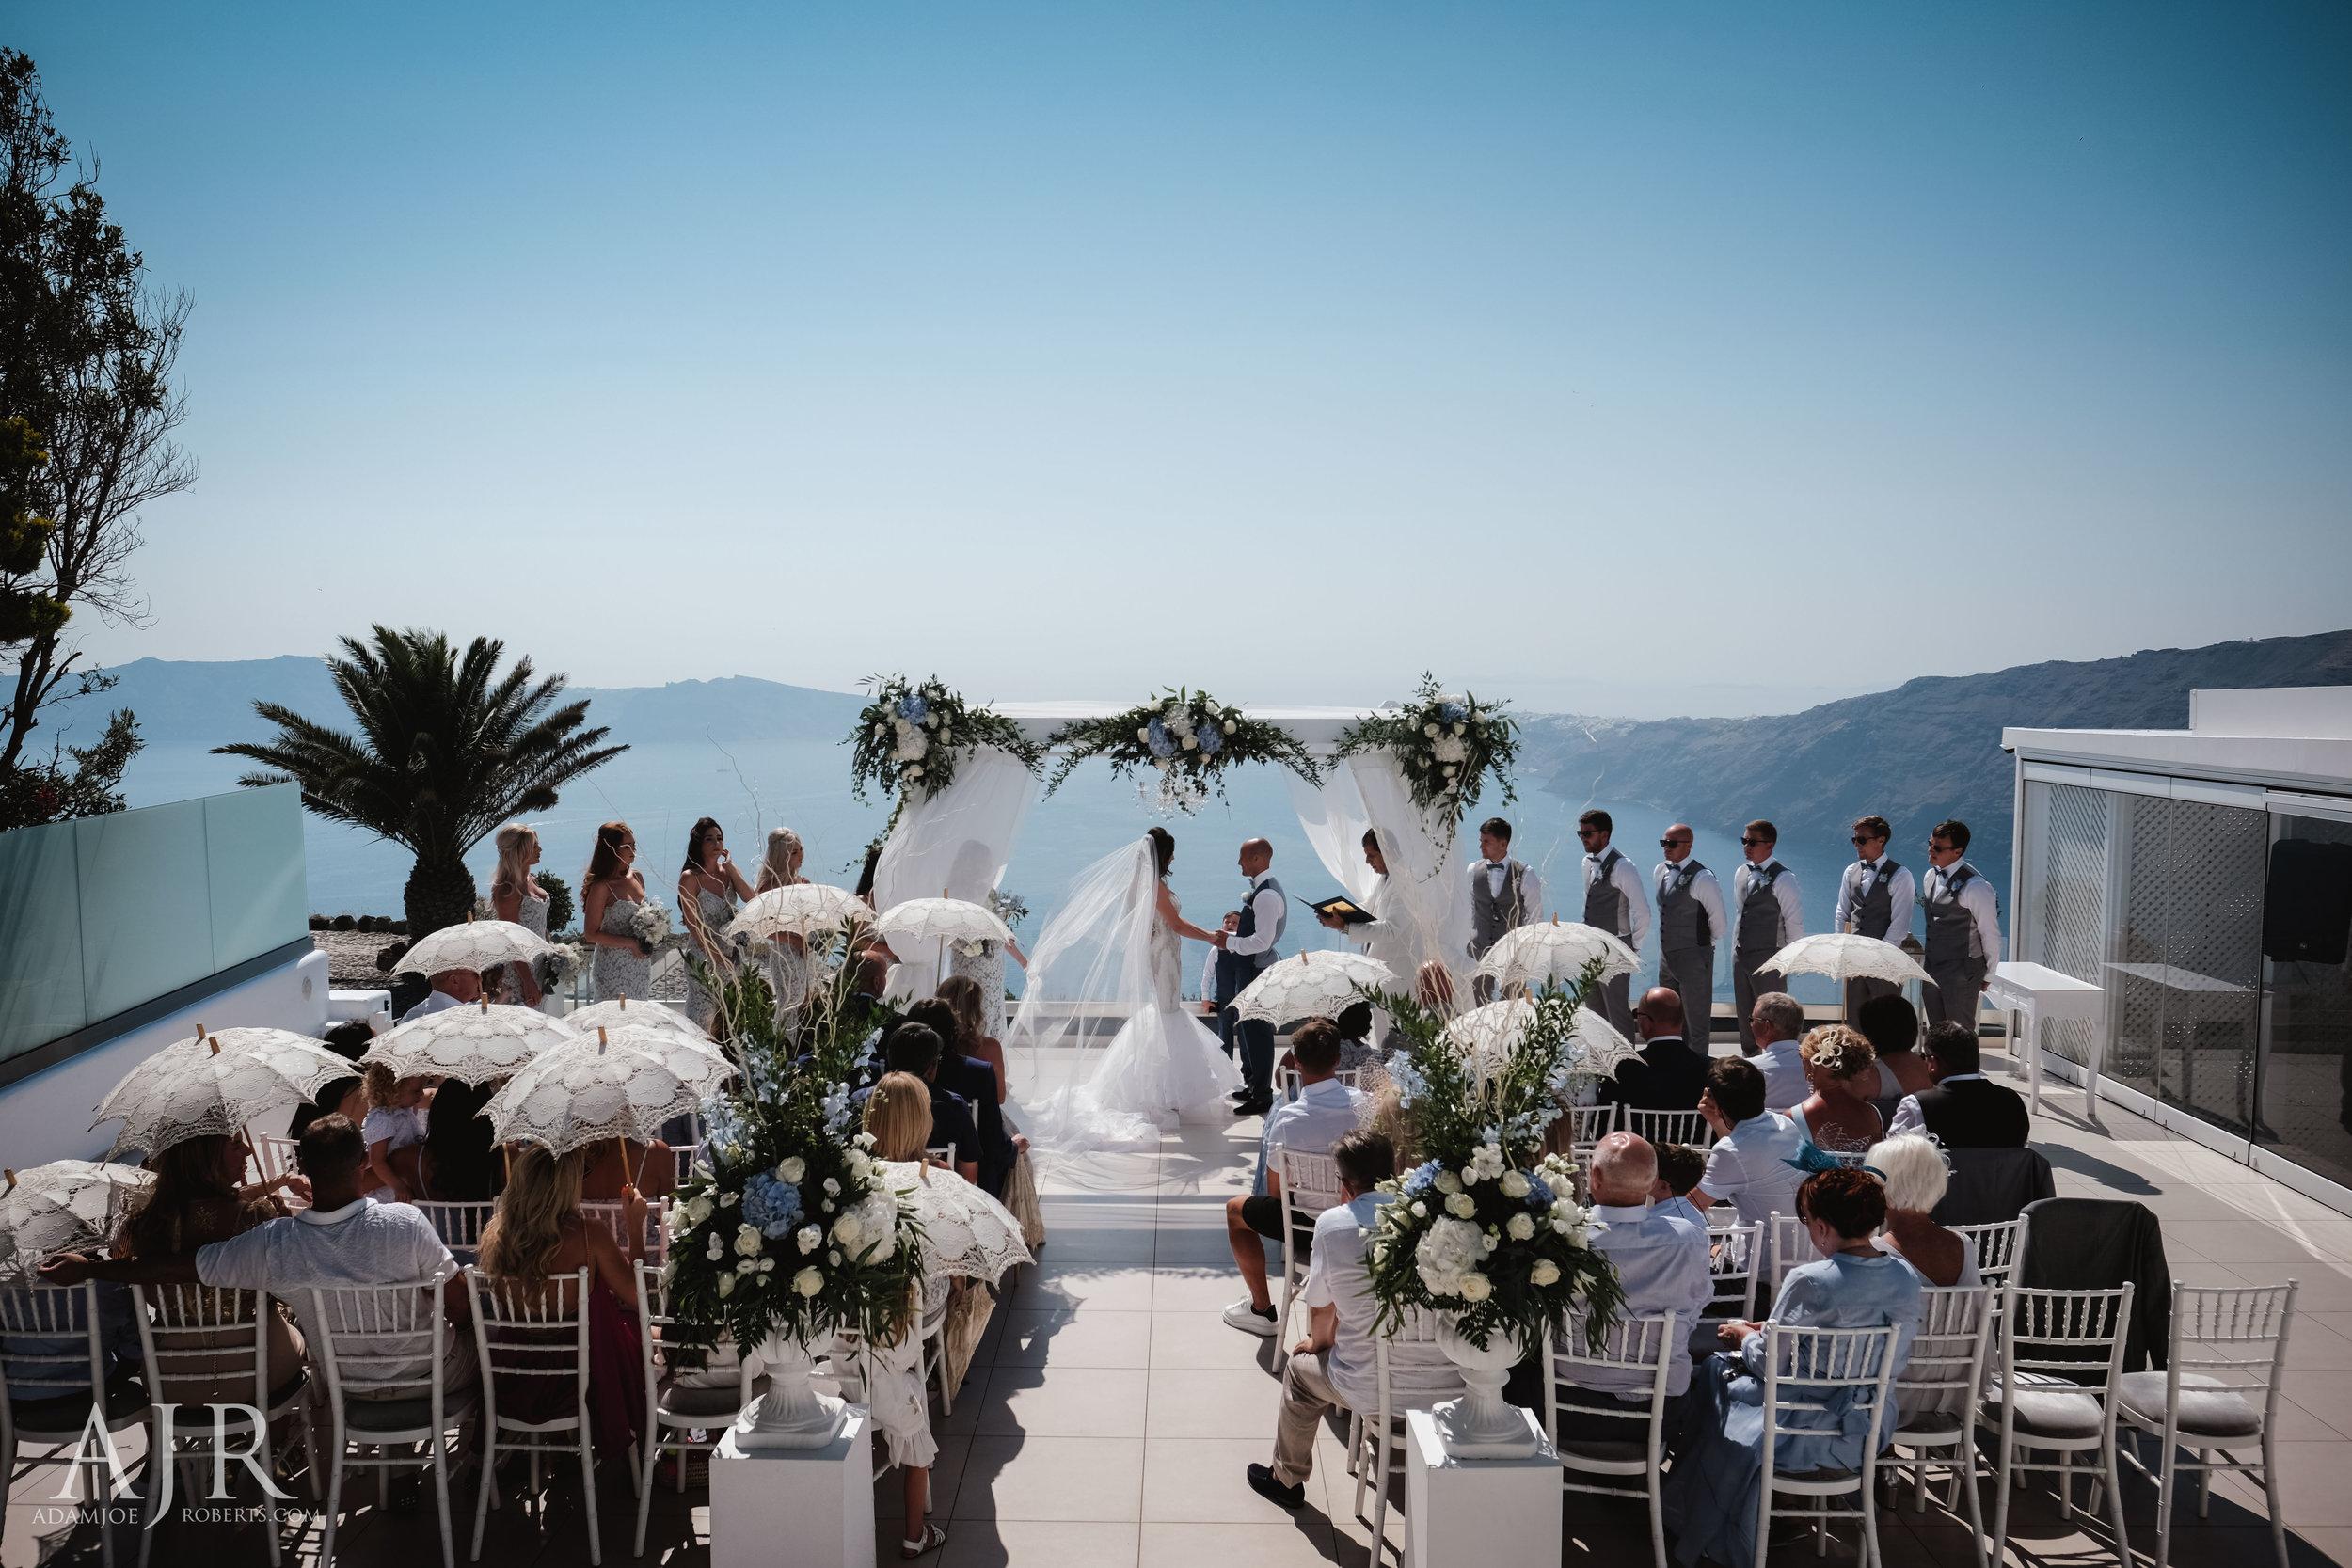 Mollie and Antony Le Ciel Santorini Destination Wedding - Sneak Peek (3 of 15).jpg